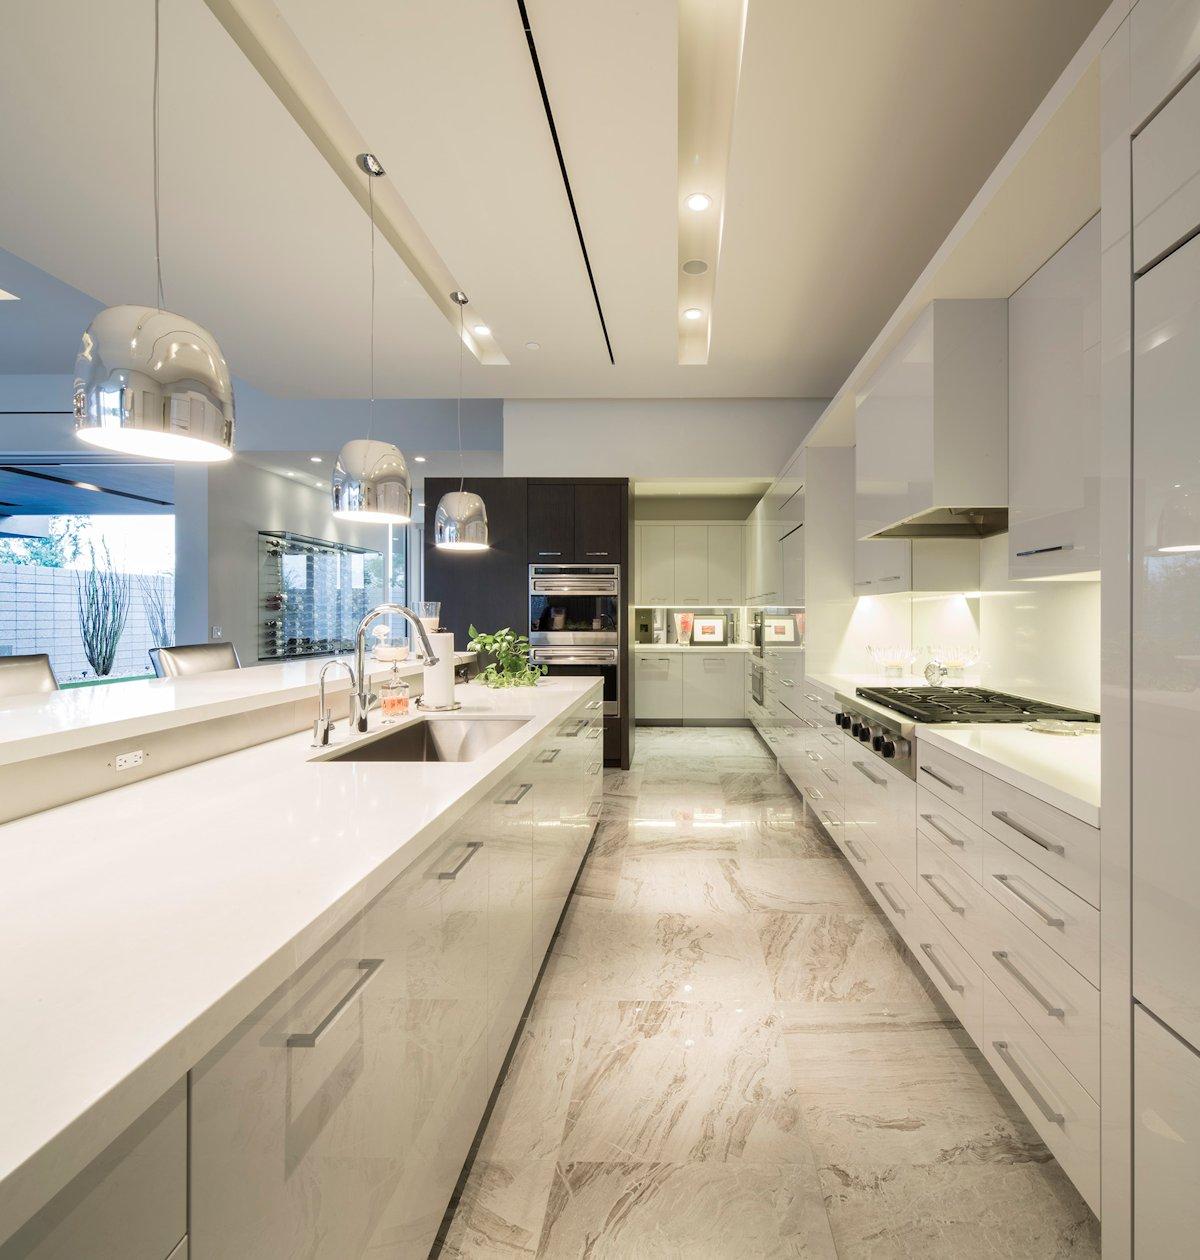 Kitchen Cabinets Scottsdale Az: Mid-Century Modern Inspired Birds Nest Residence In